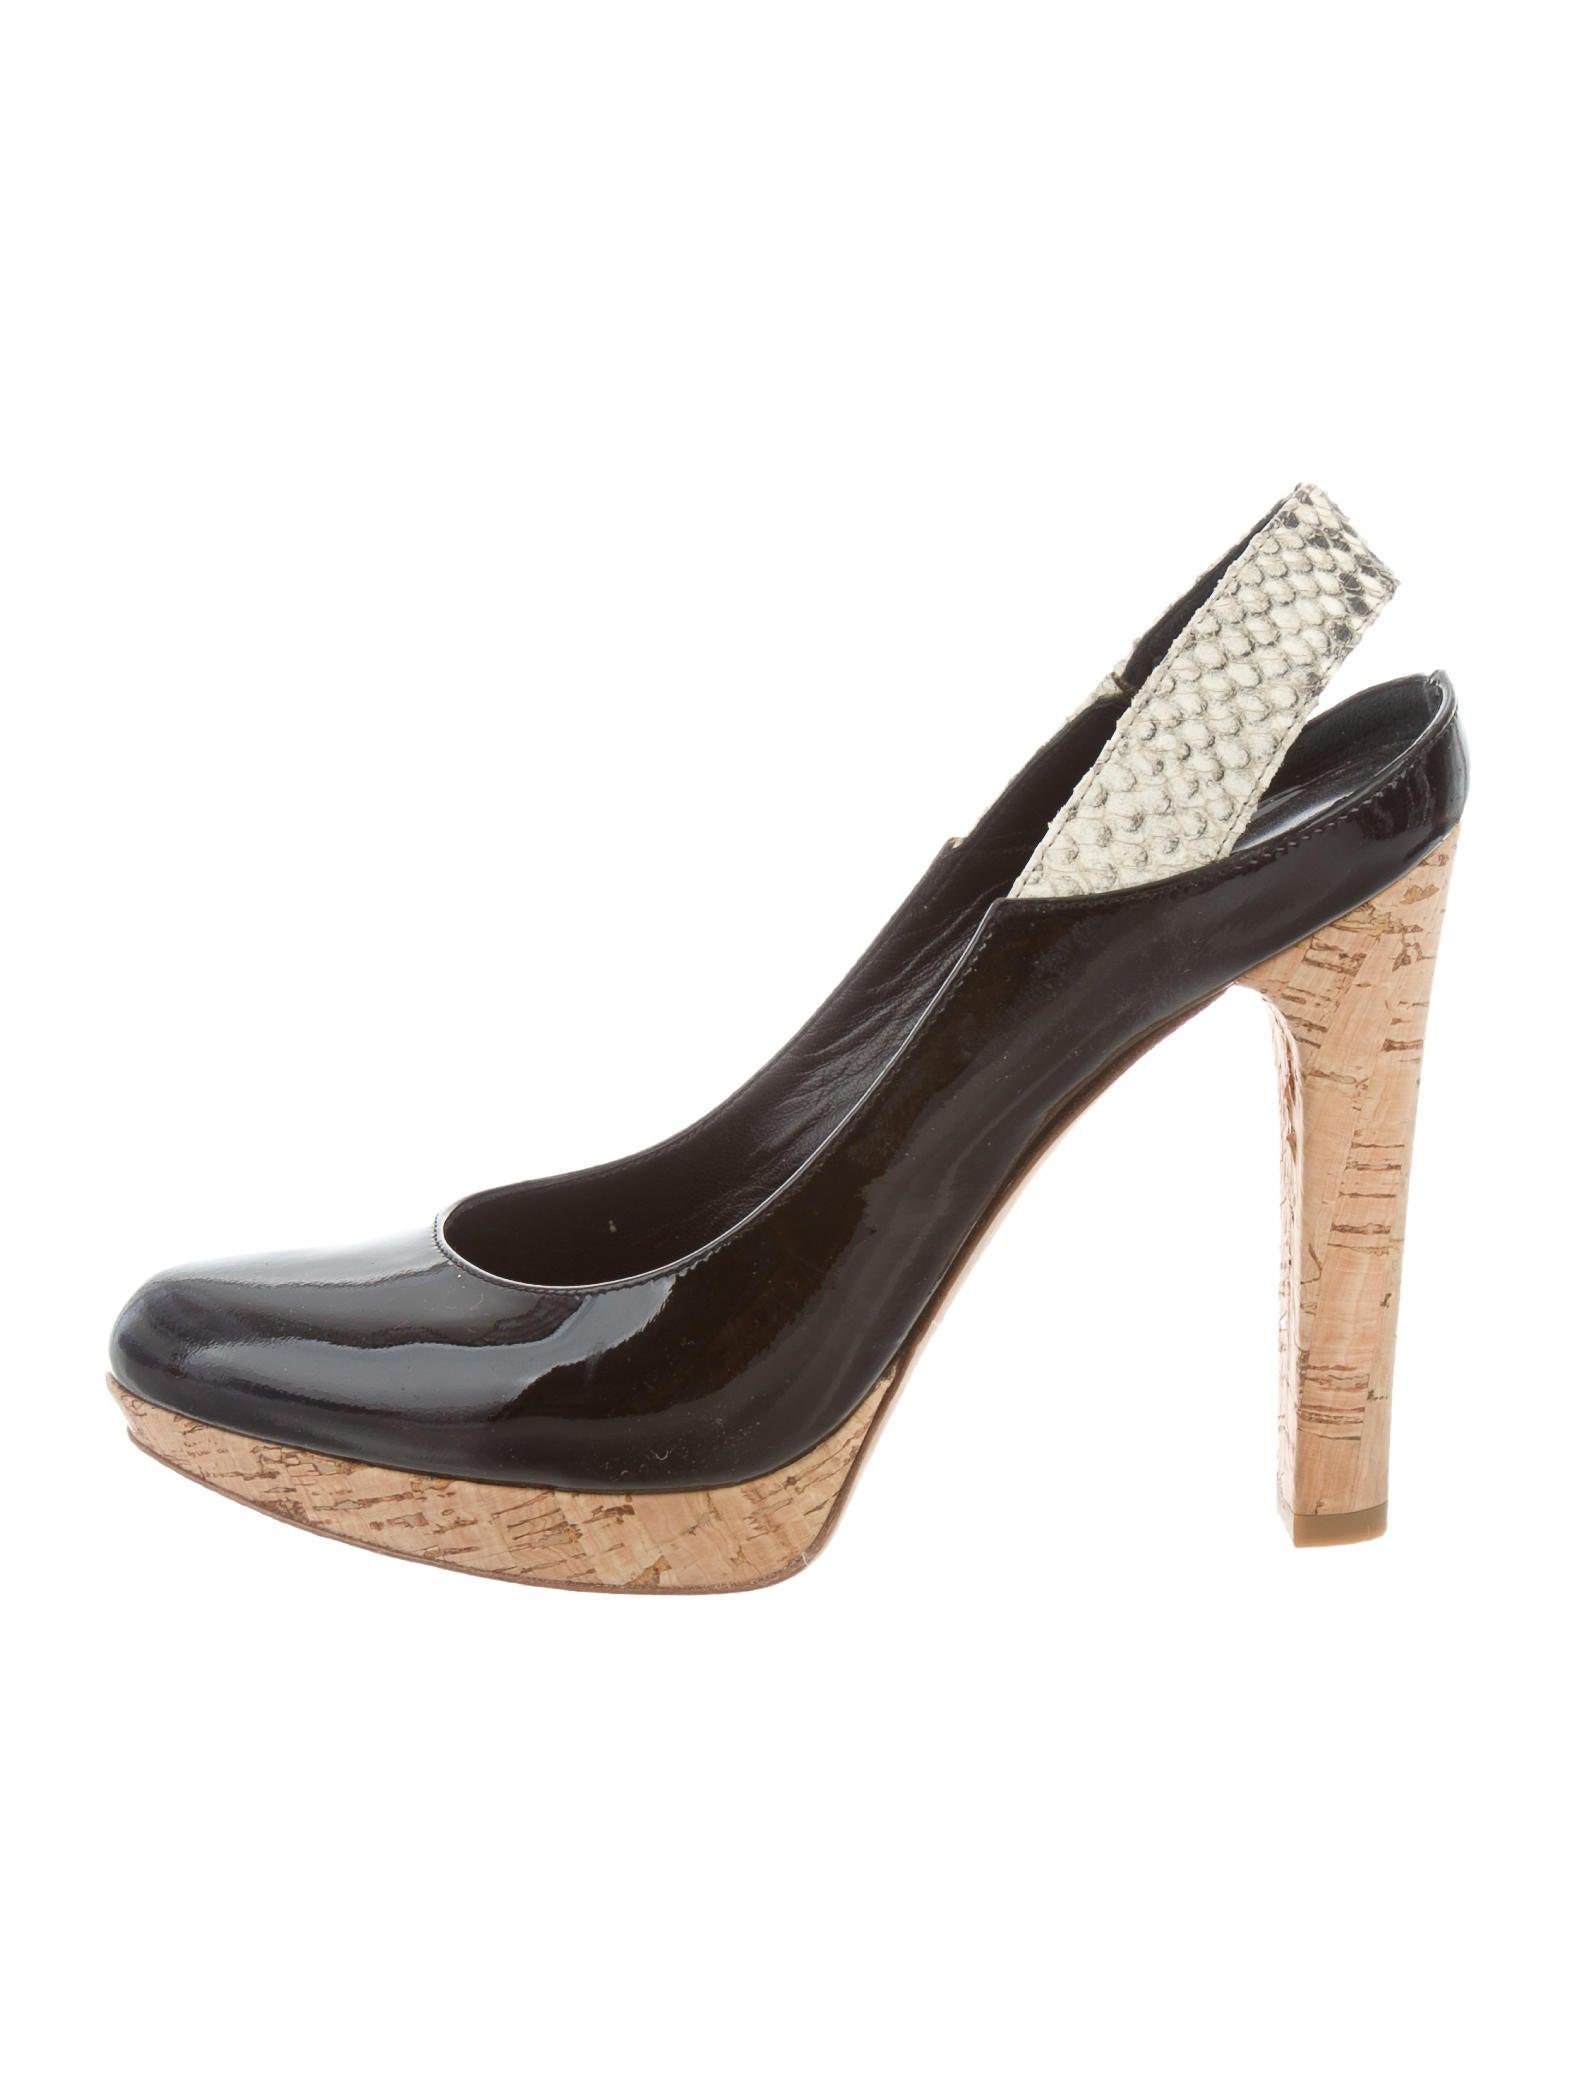 Fendi Round-Toe Slingback Pumps - Shoes - FEN58229 | The RealReal